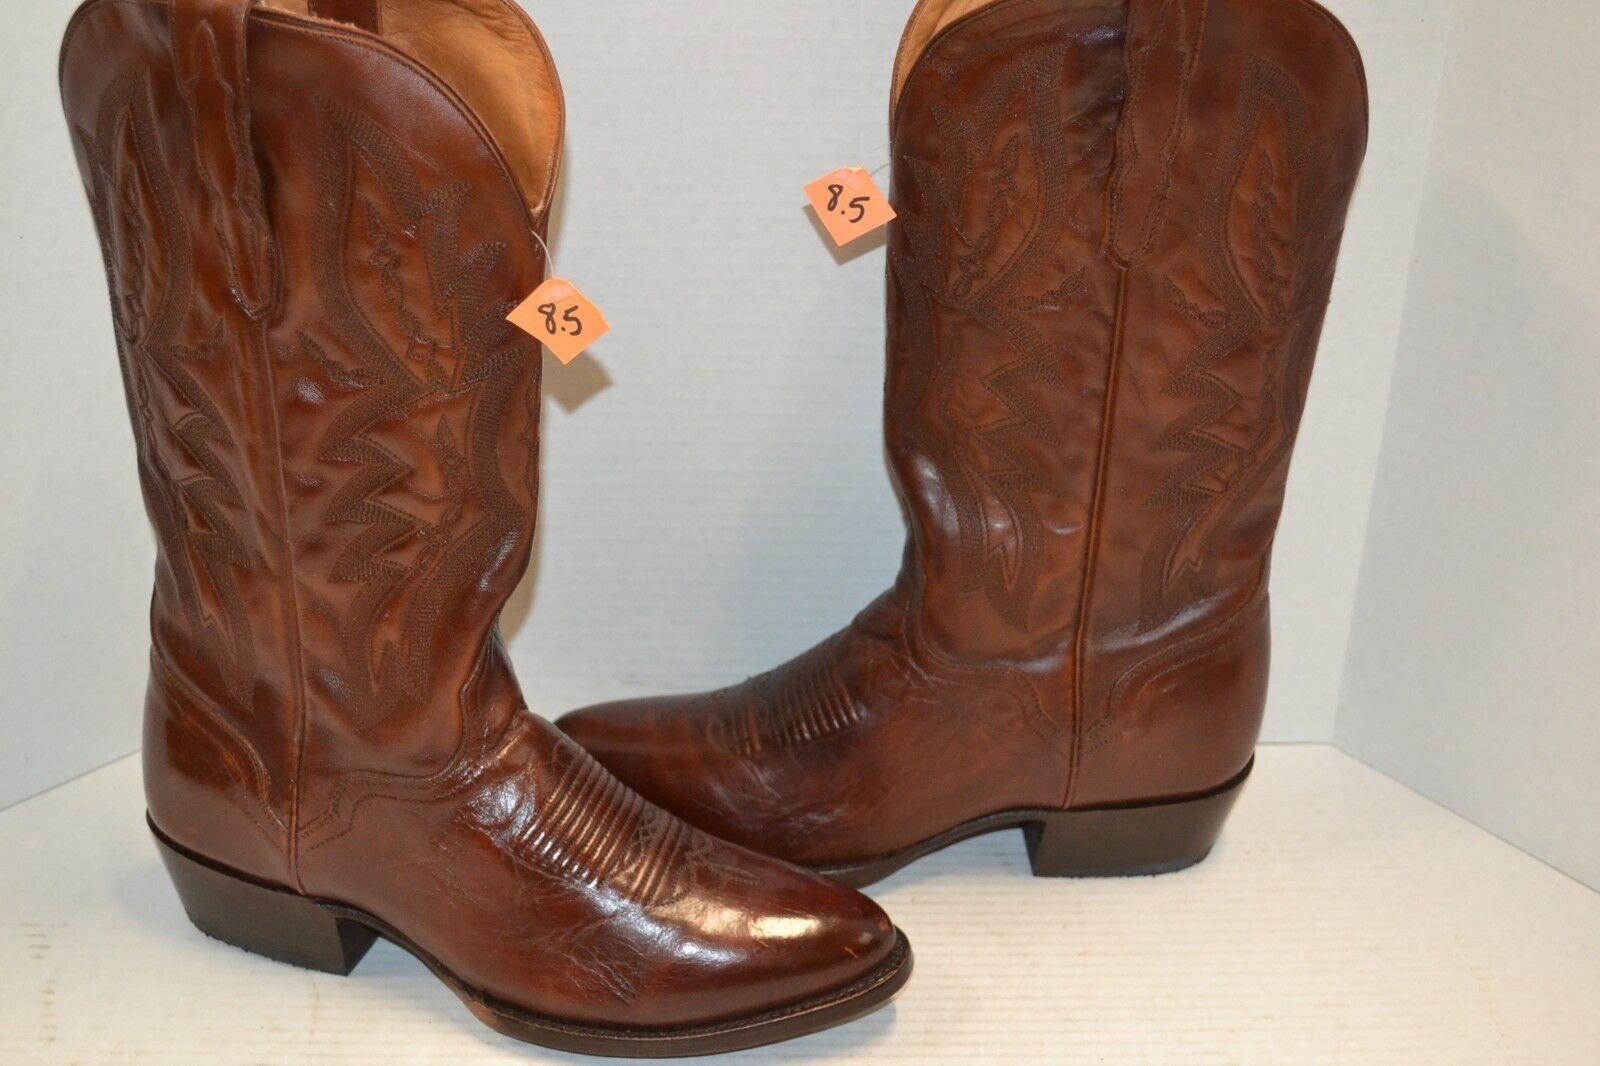 El Dorado HANDMADE Men's 8.5 EW Vanquished Calf Western COWBOY Boots ED1101 $360